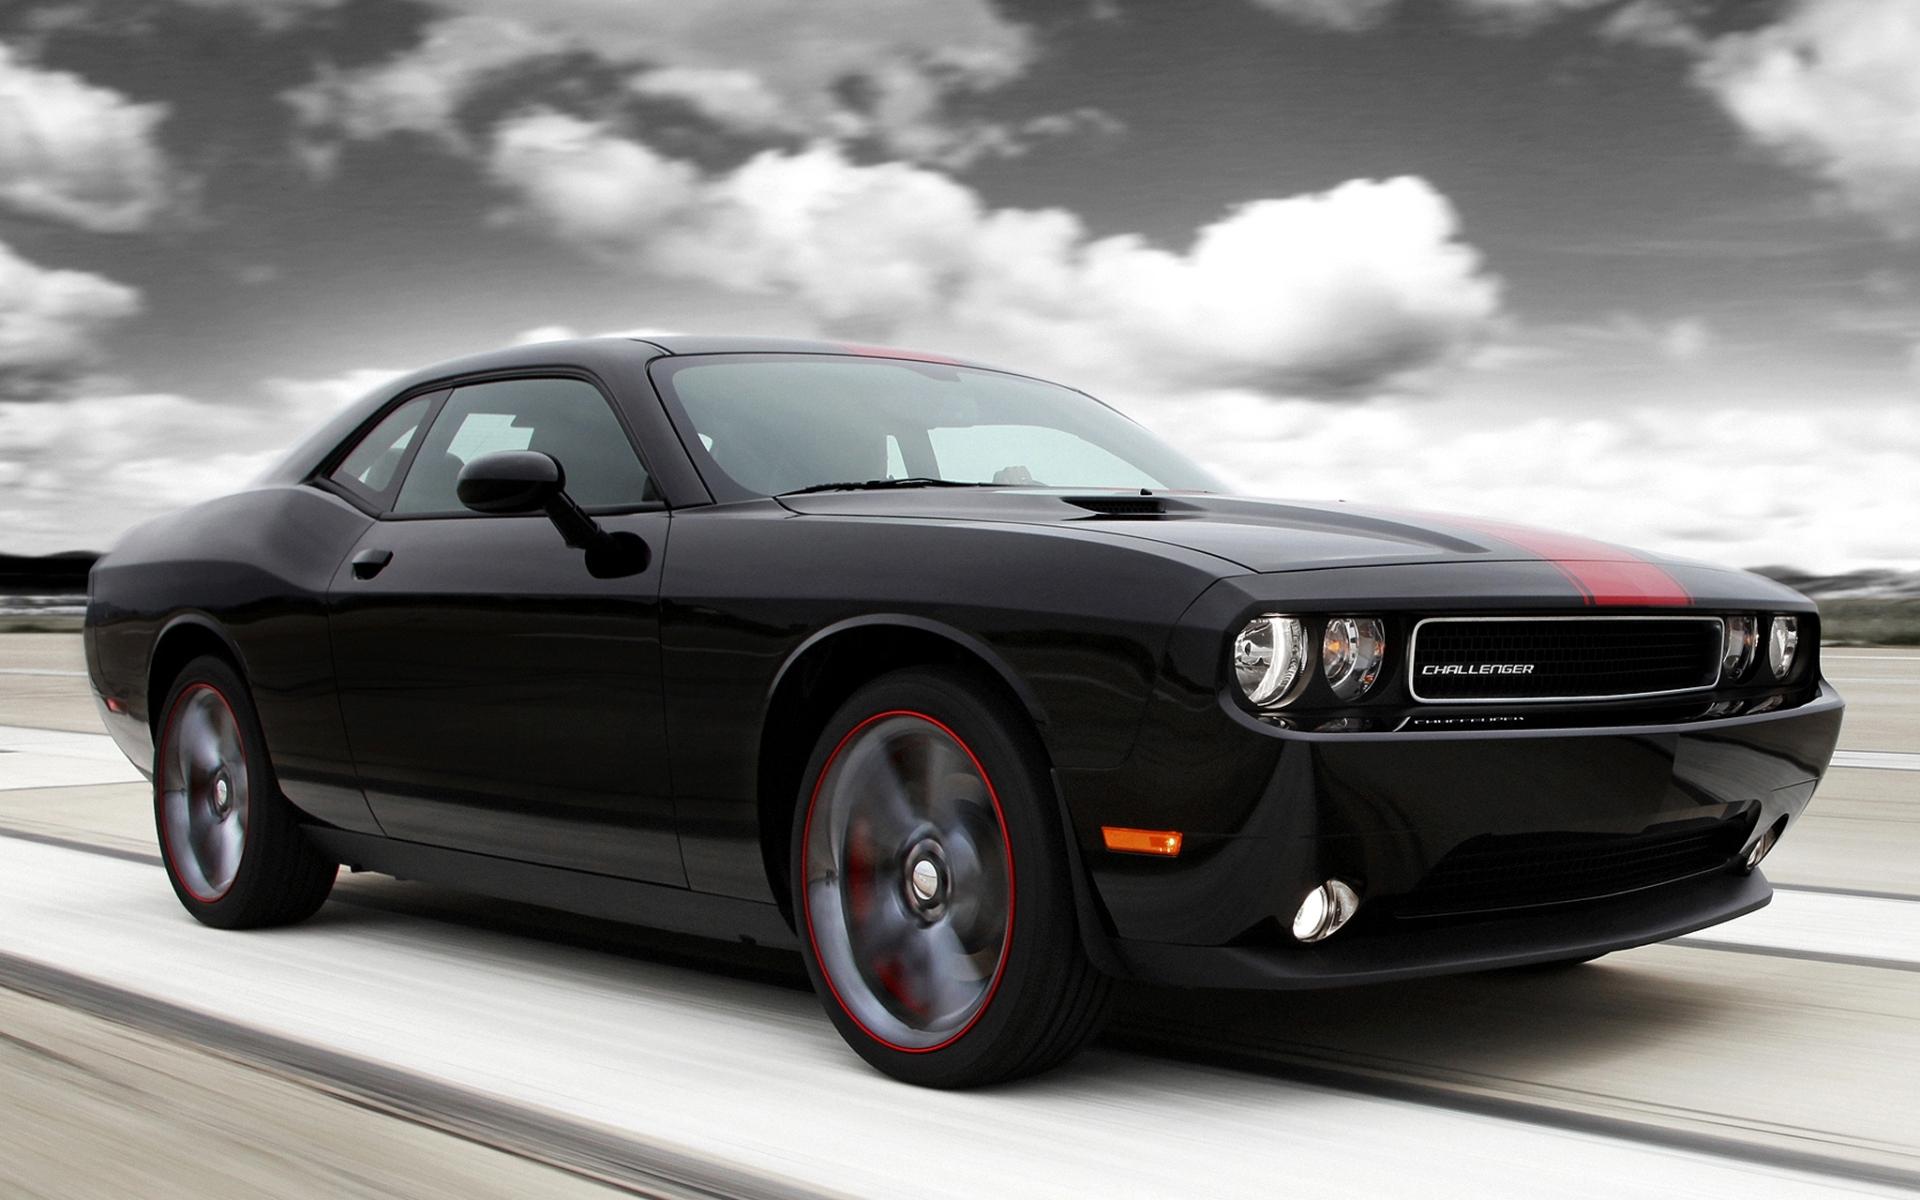 Fondos De Vehiculos: Dodge Charger Fondos De Pantalla, Fondos De Escritorio